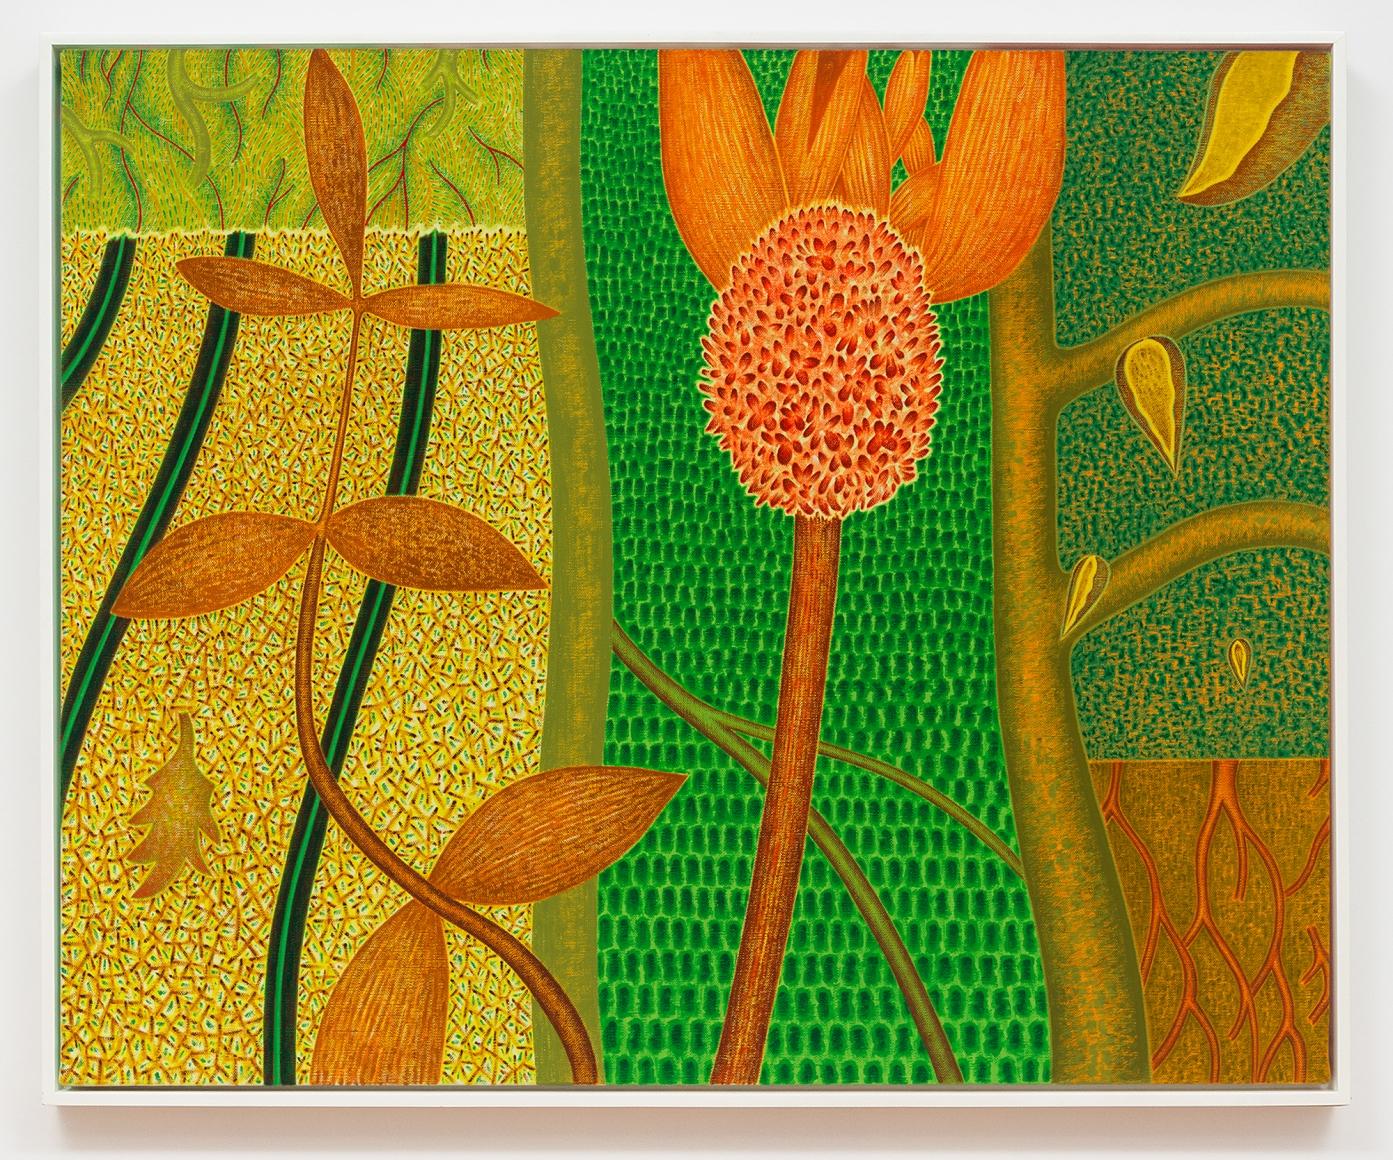 3 Gardens, 1990, Oil on canvas